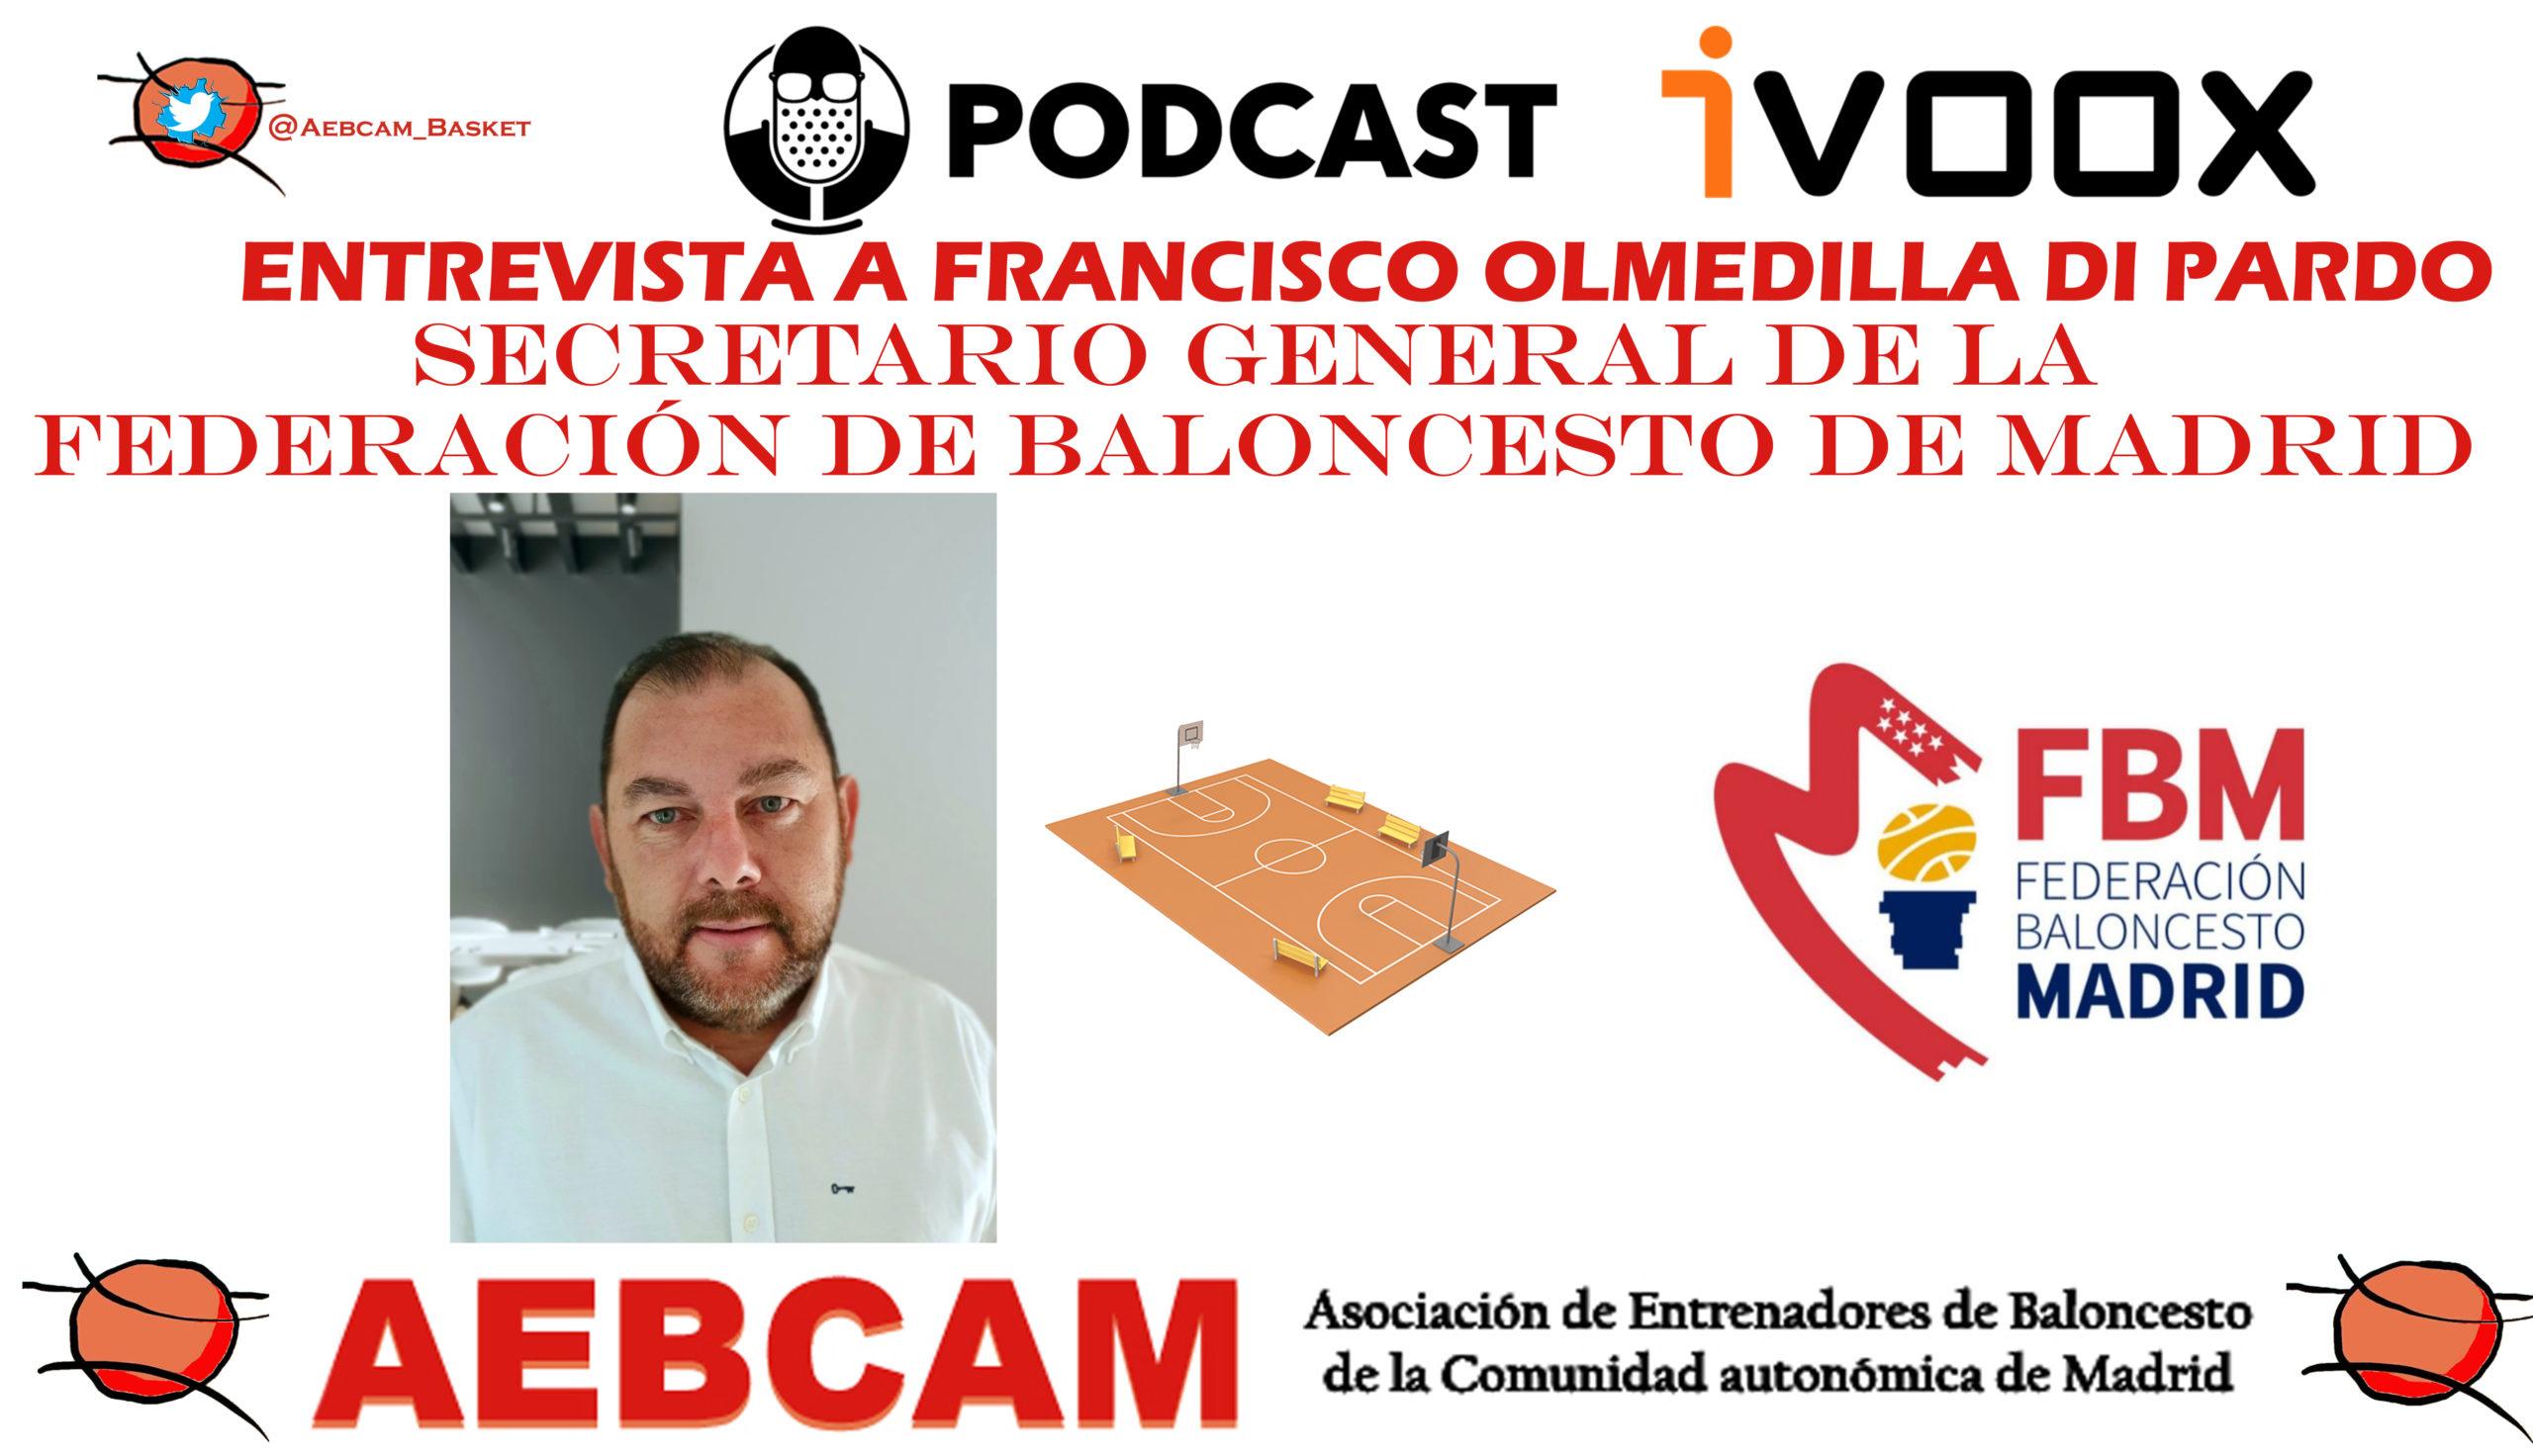 Entrevista a Francisco Olmedilla